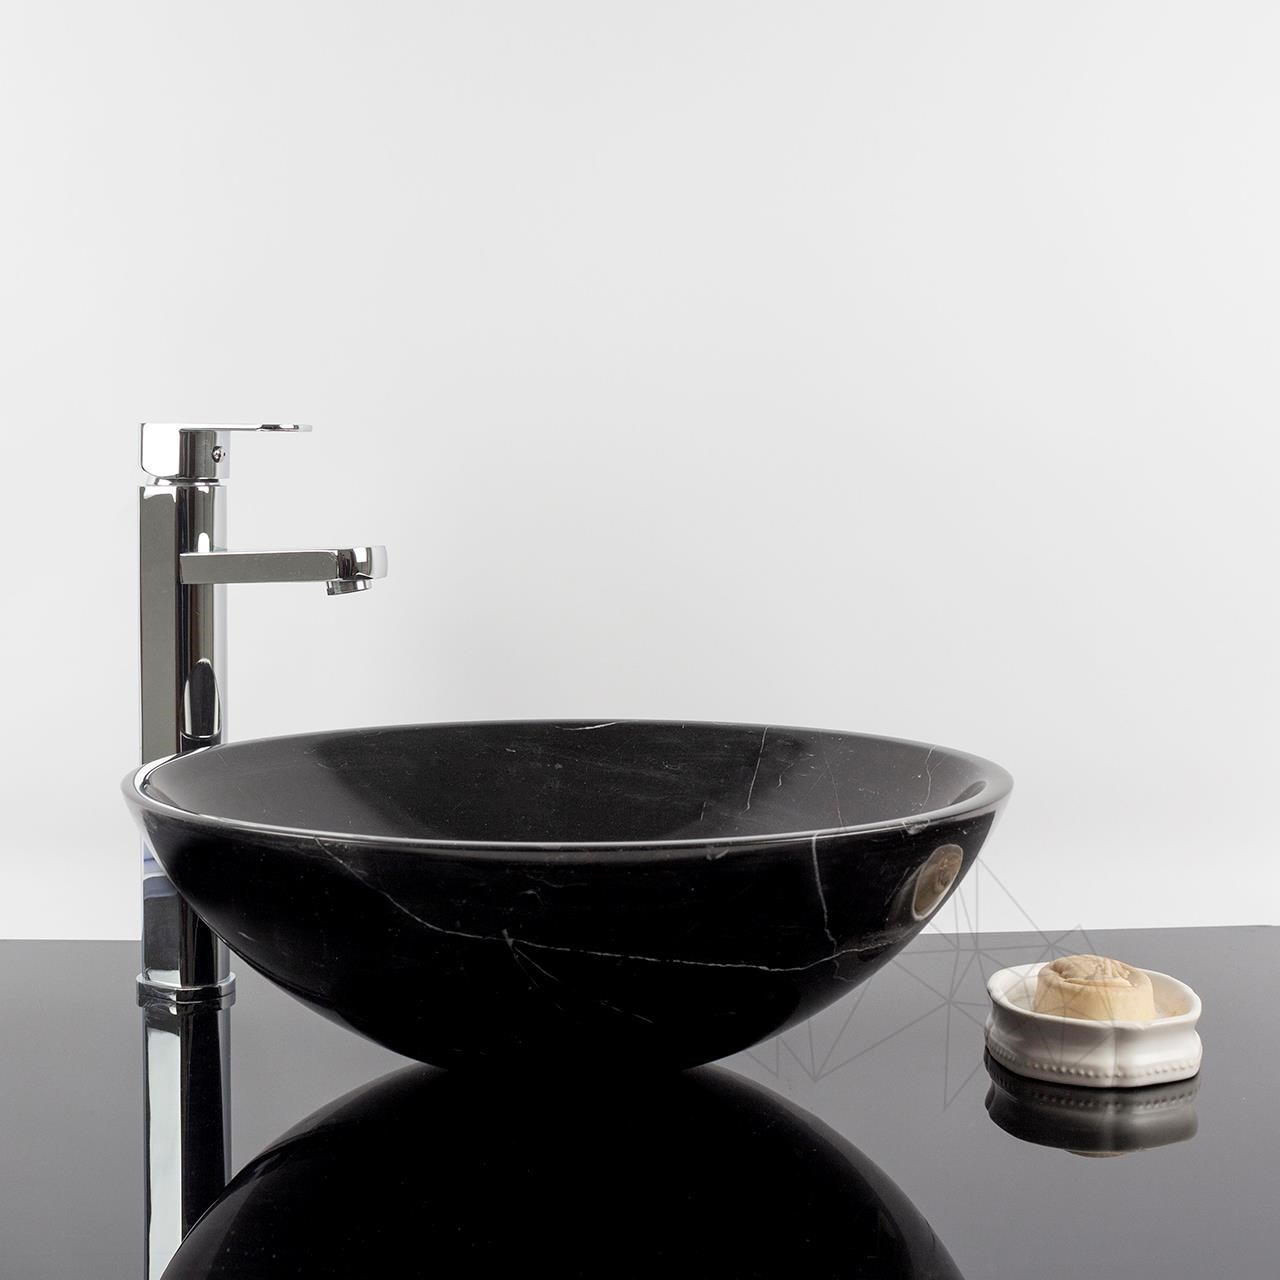 Bathroom Sink - Nero Marquina Marble, 42 x 14 cm